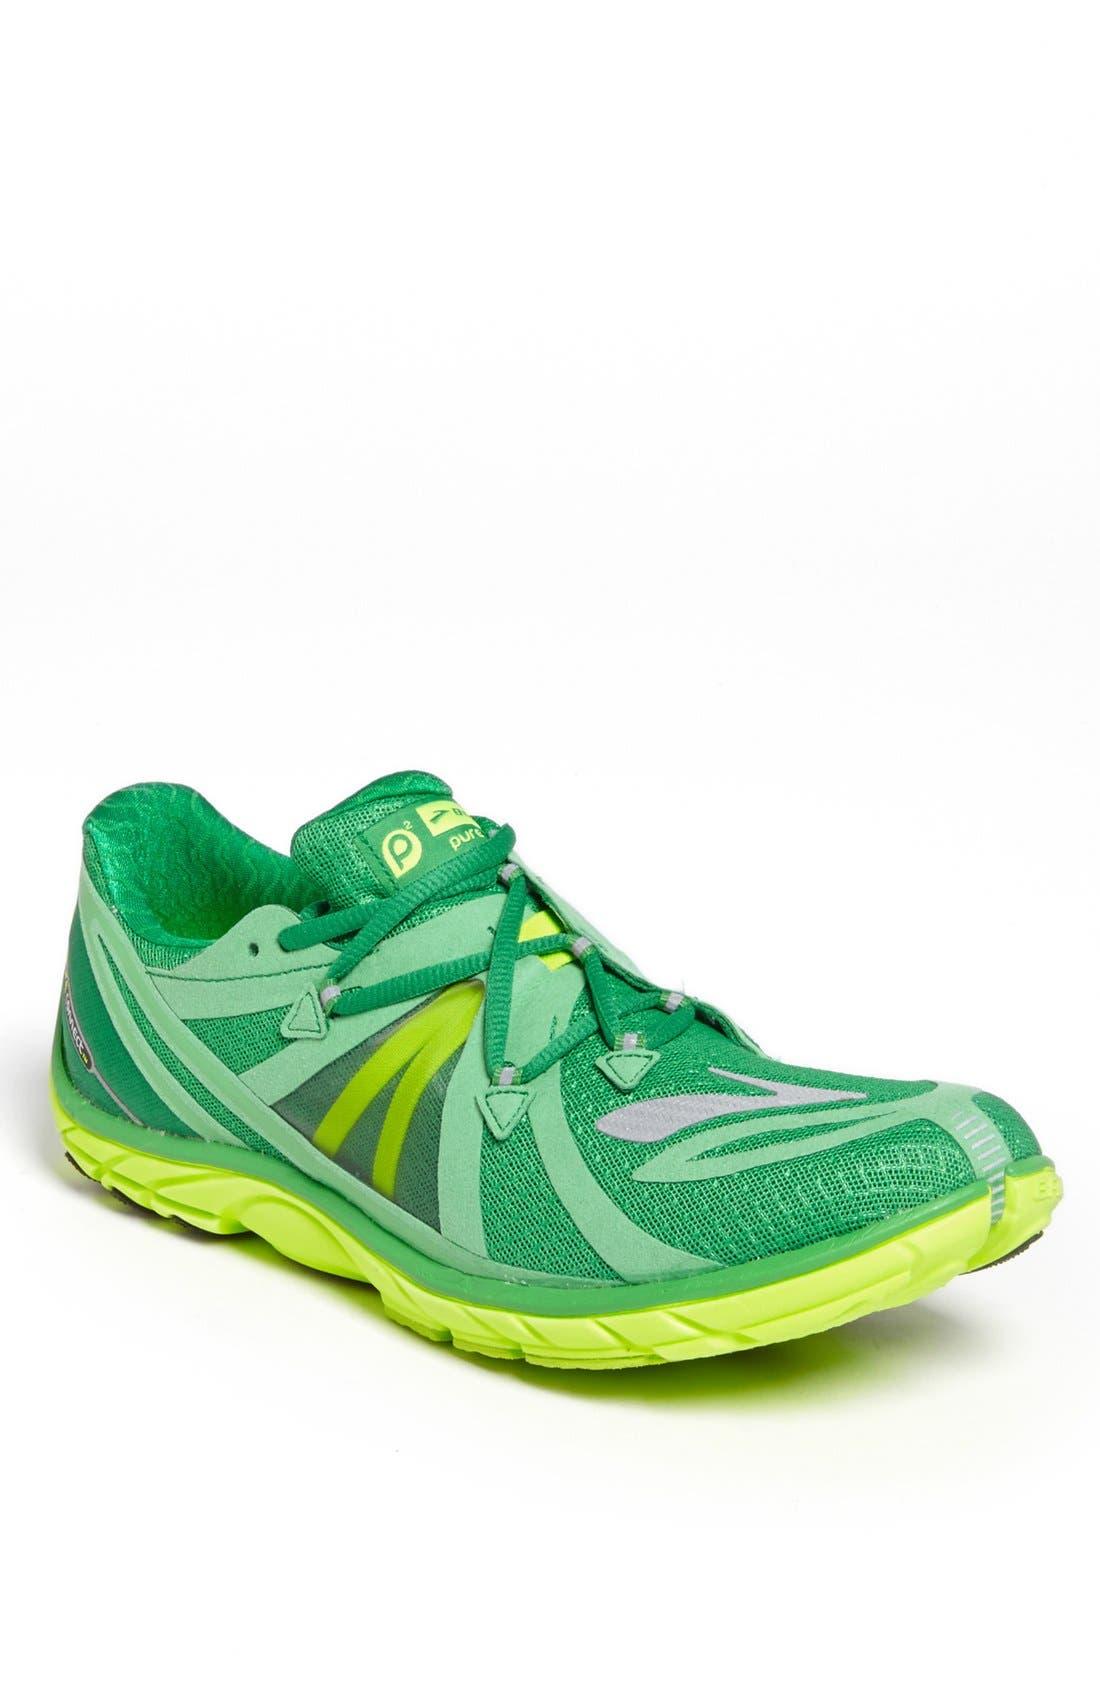 Main Image - Brooks 'PureConnect 2' Running Shoe (Men)